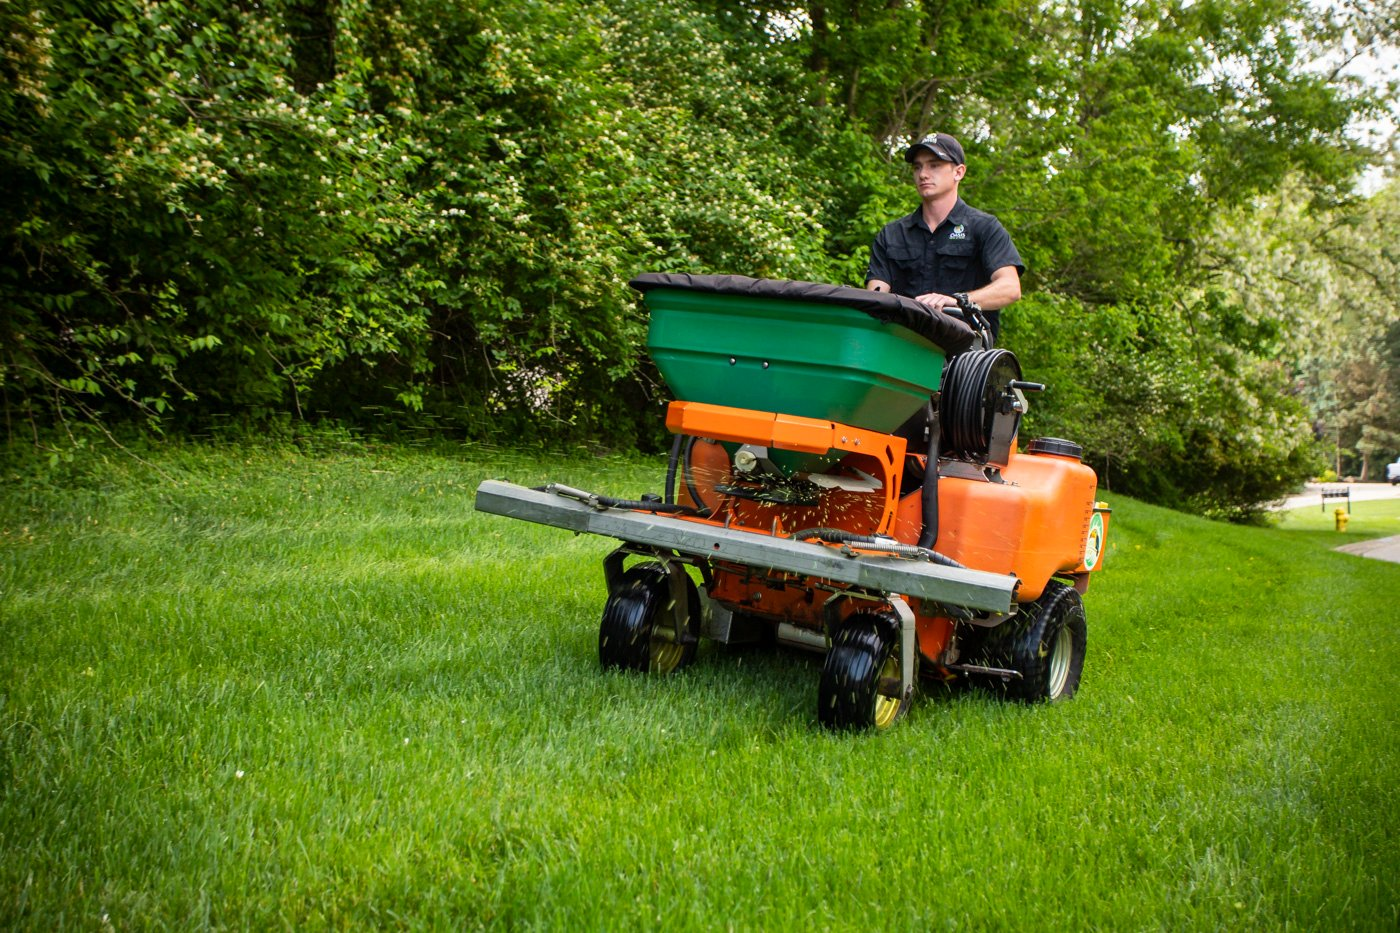 Oasis lawn care technician applying granular fertilizer